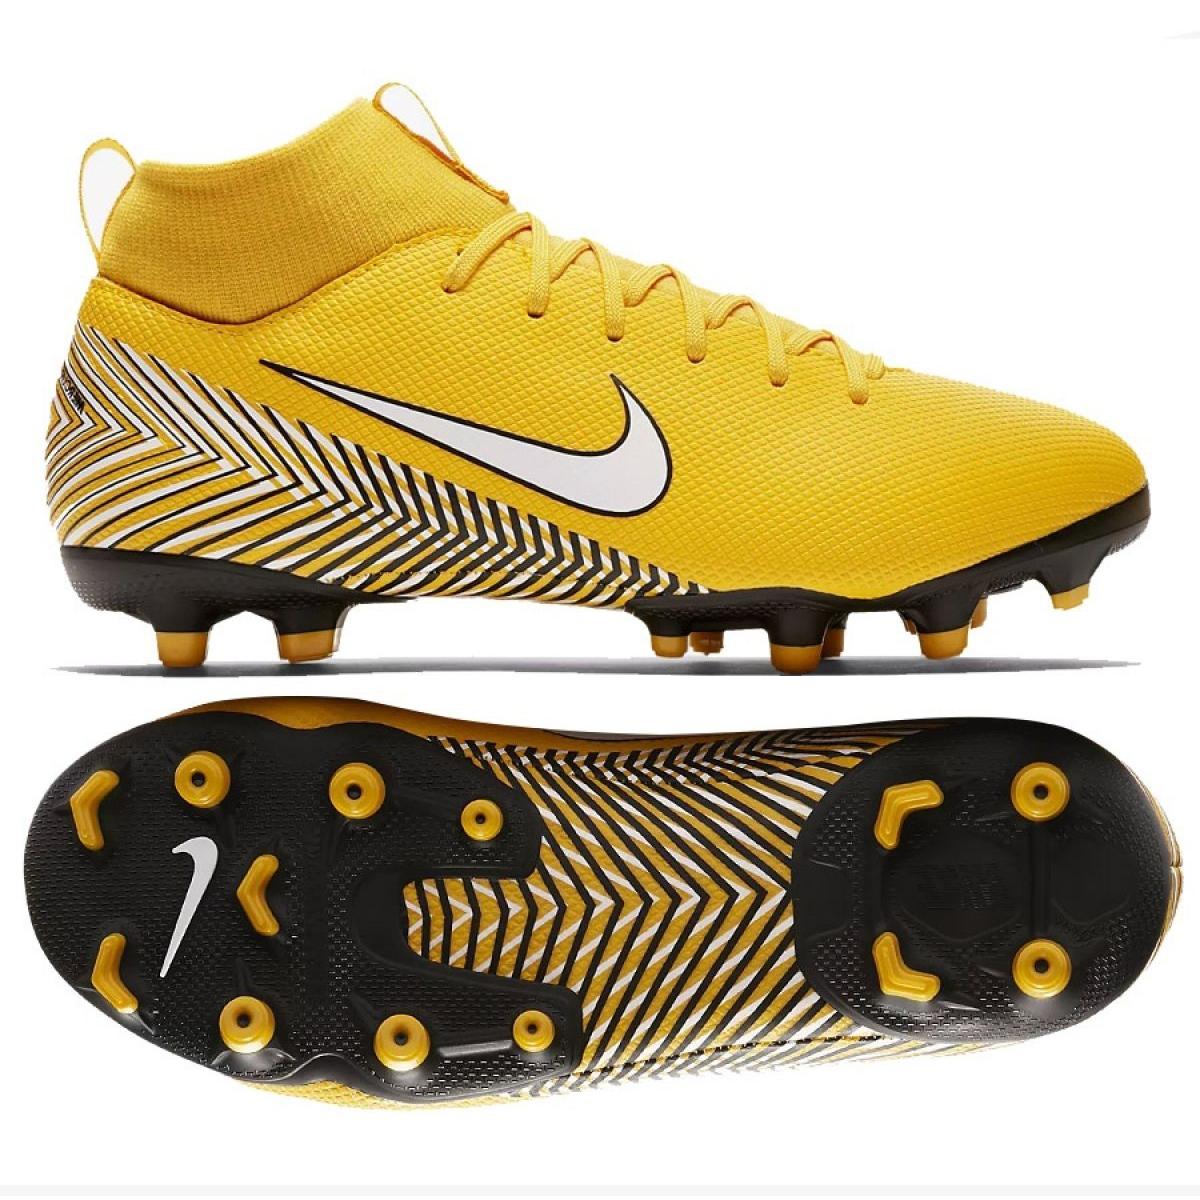 Nike Mercurial Superfly VI Academy Neymar Jr. AO2895